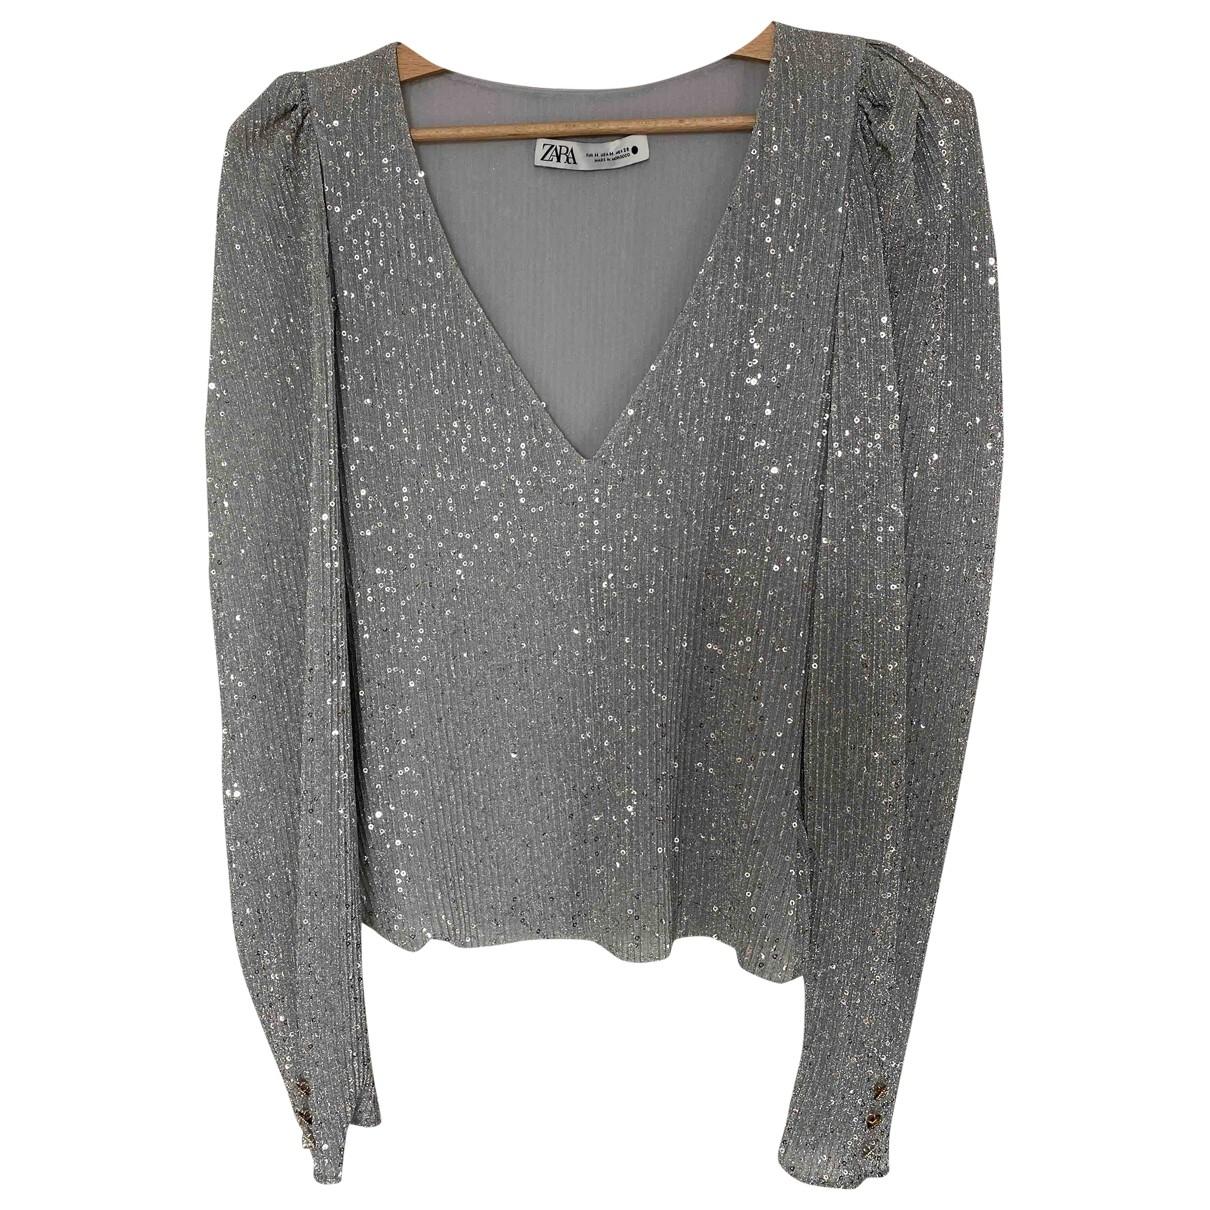 Zara \N Silver  top for Women M International